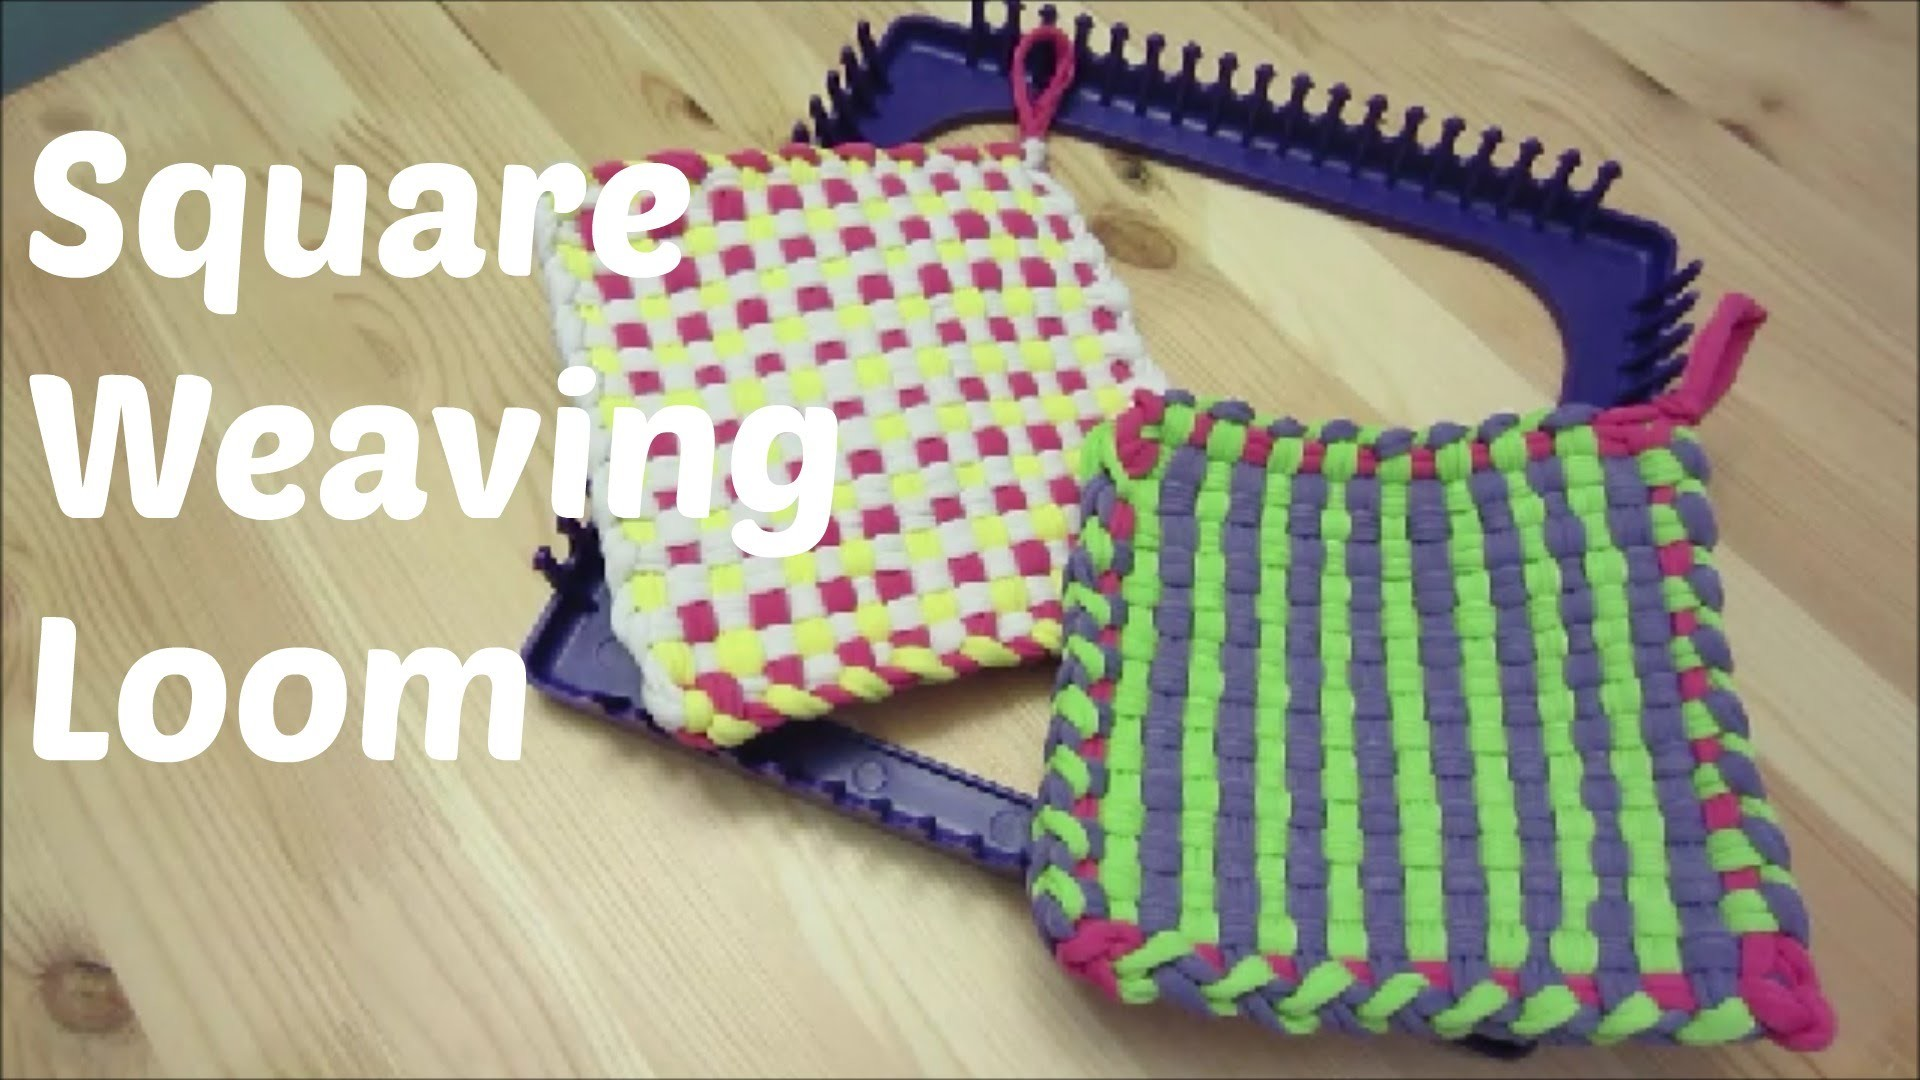 Square Weaving Loom